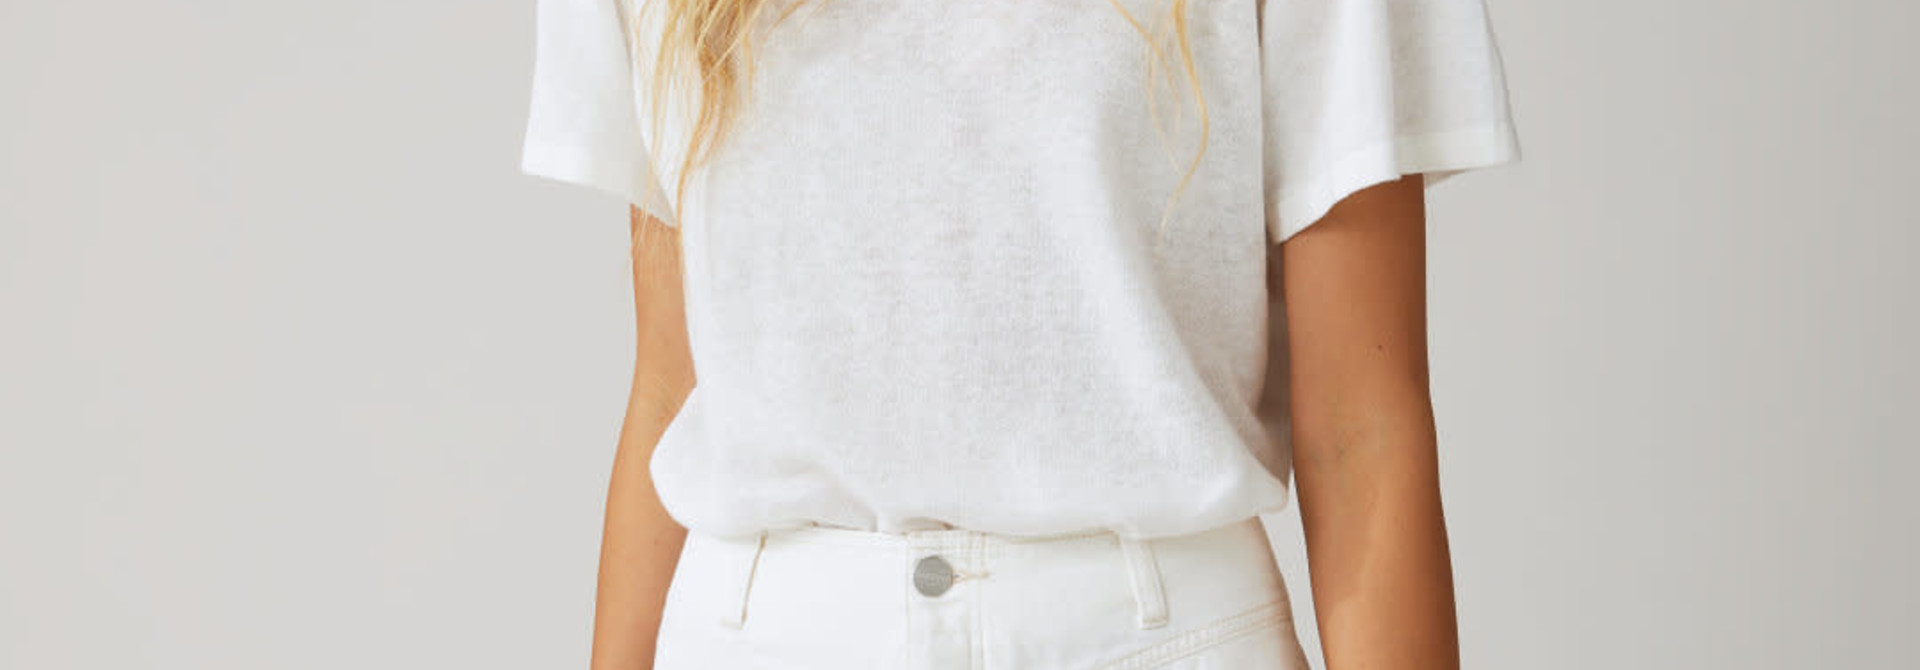 Ibbie skirt